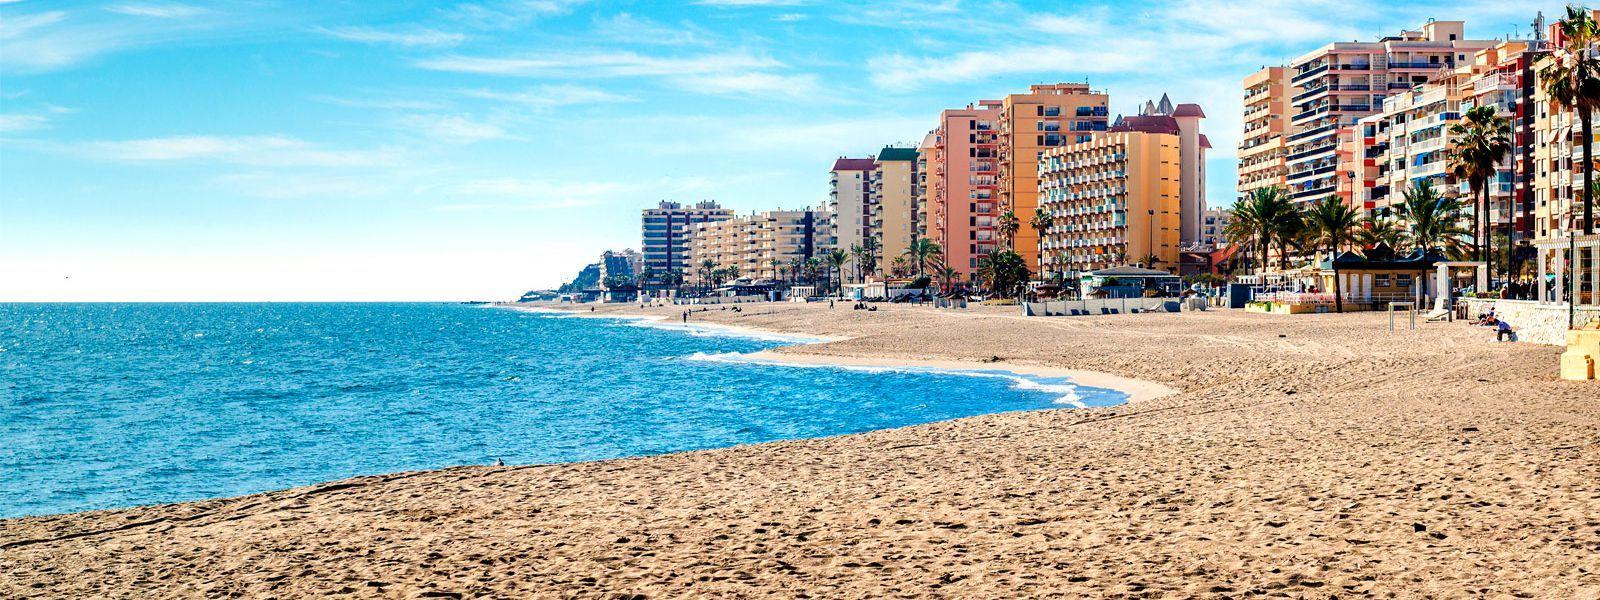 Fuengirola Beach Hotel Spain